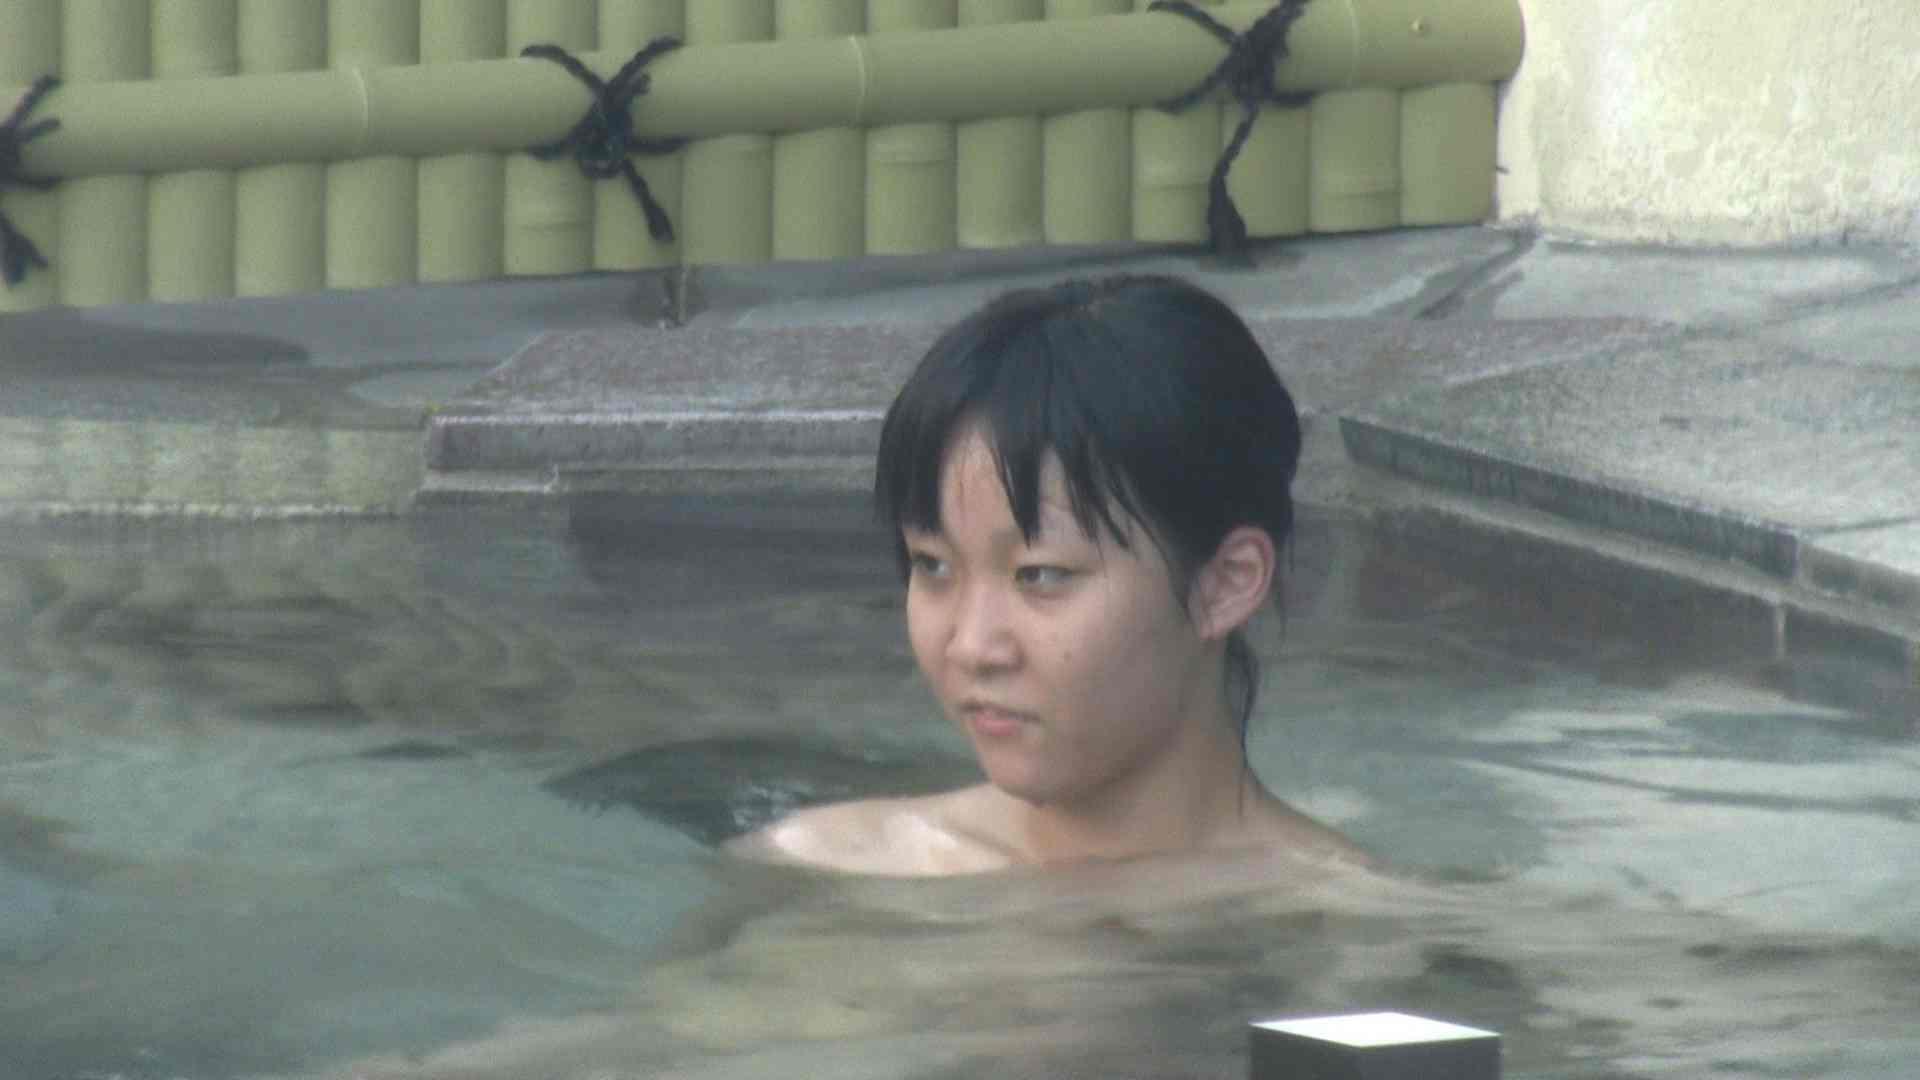 Aquaな露天風呂Vol.196 盗撮 オメコ無修正動画無料 56PICs 11